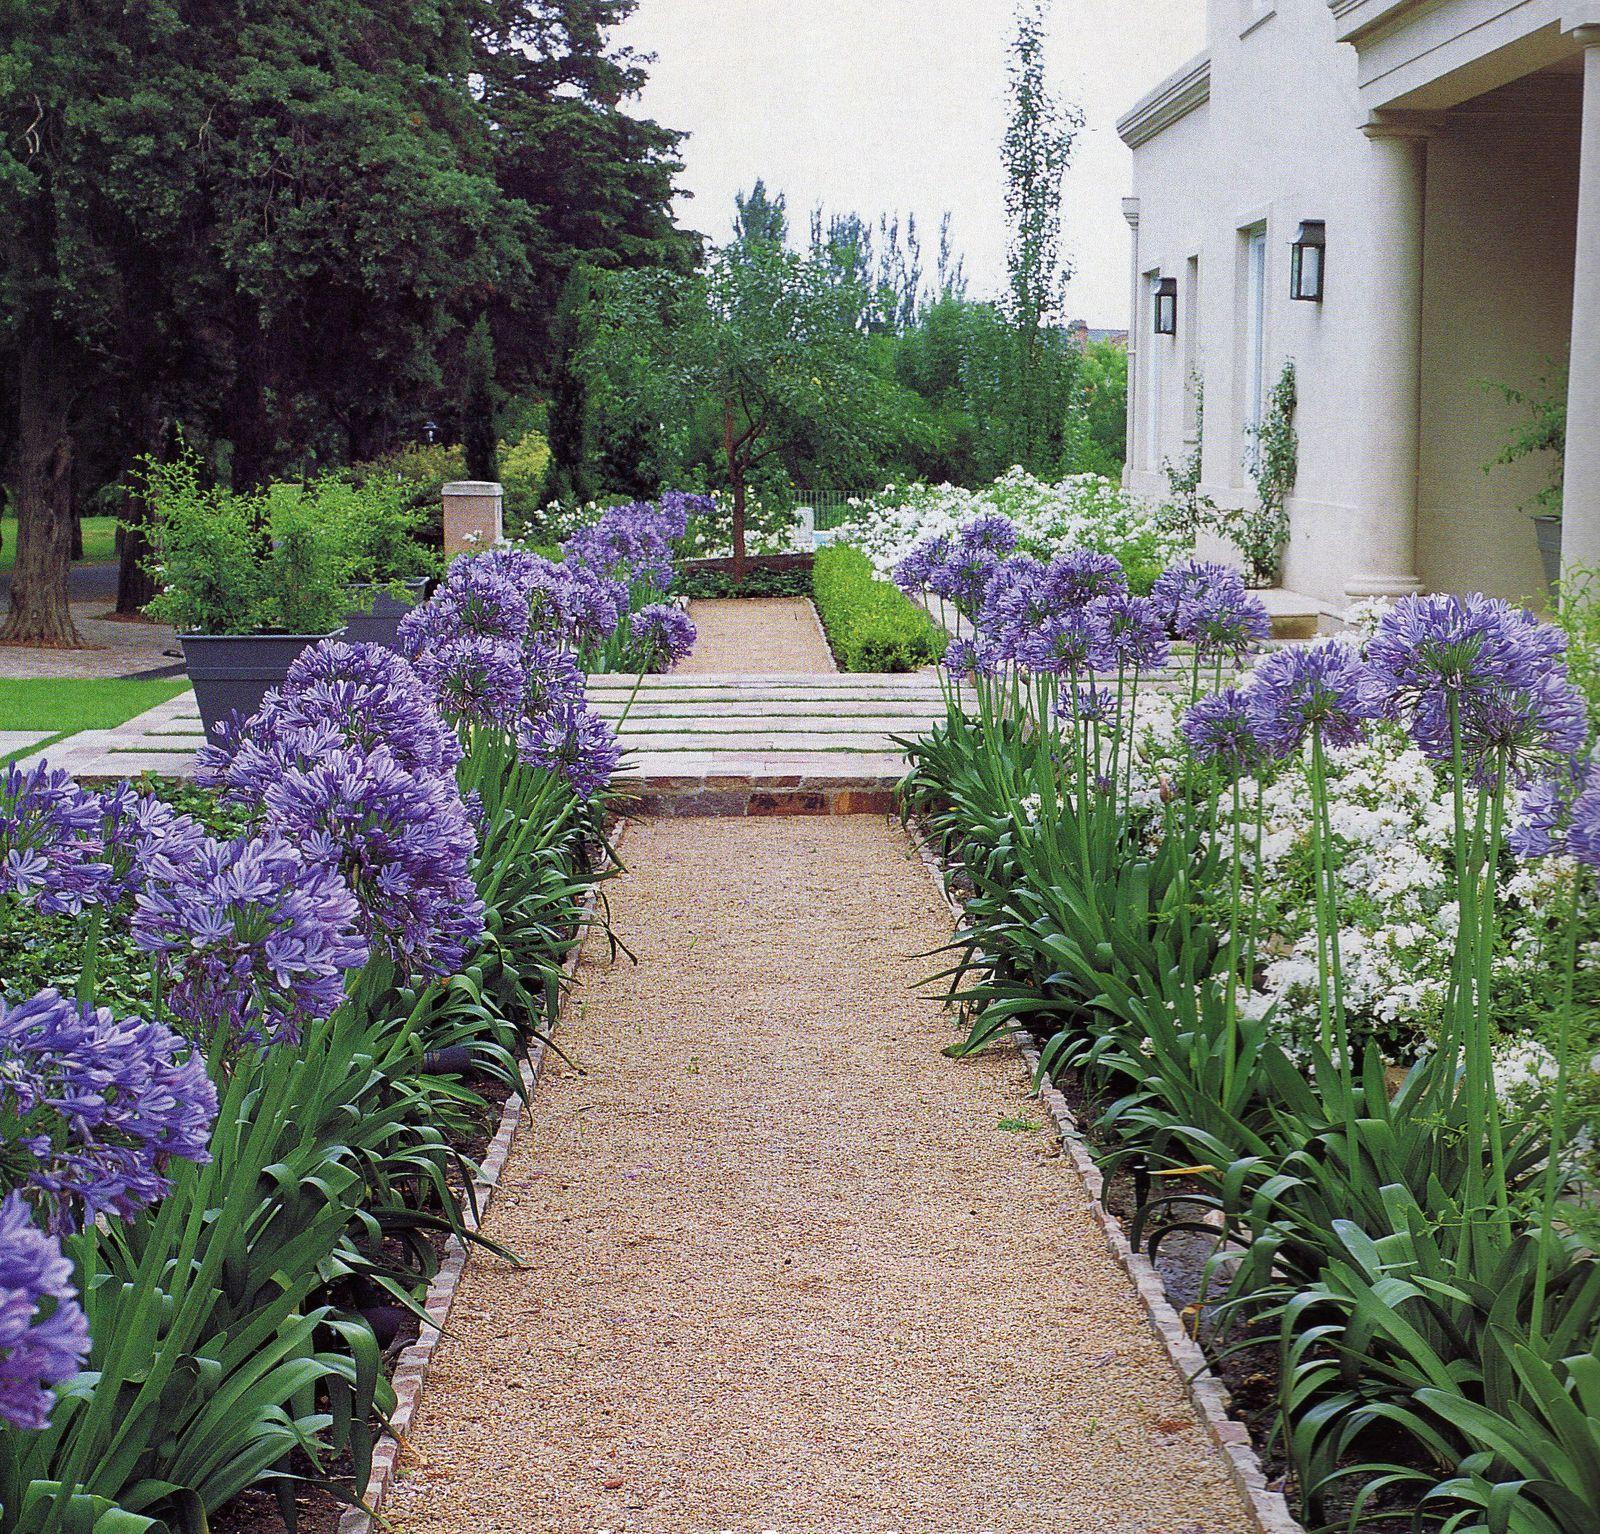 26f3d9d4c506cbdee46dfdfca18aa9d5 - Names Of Gardens In The World